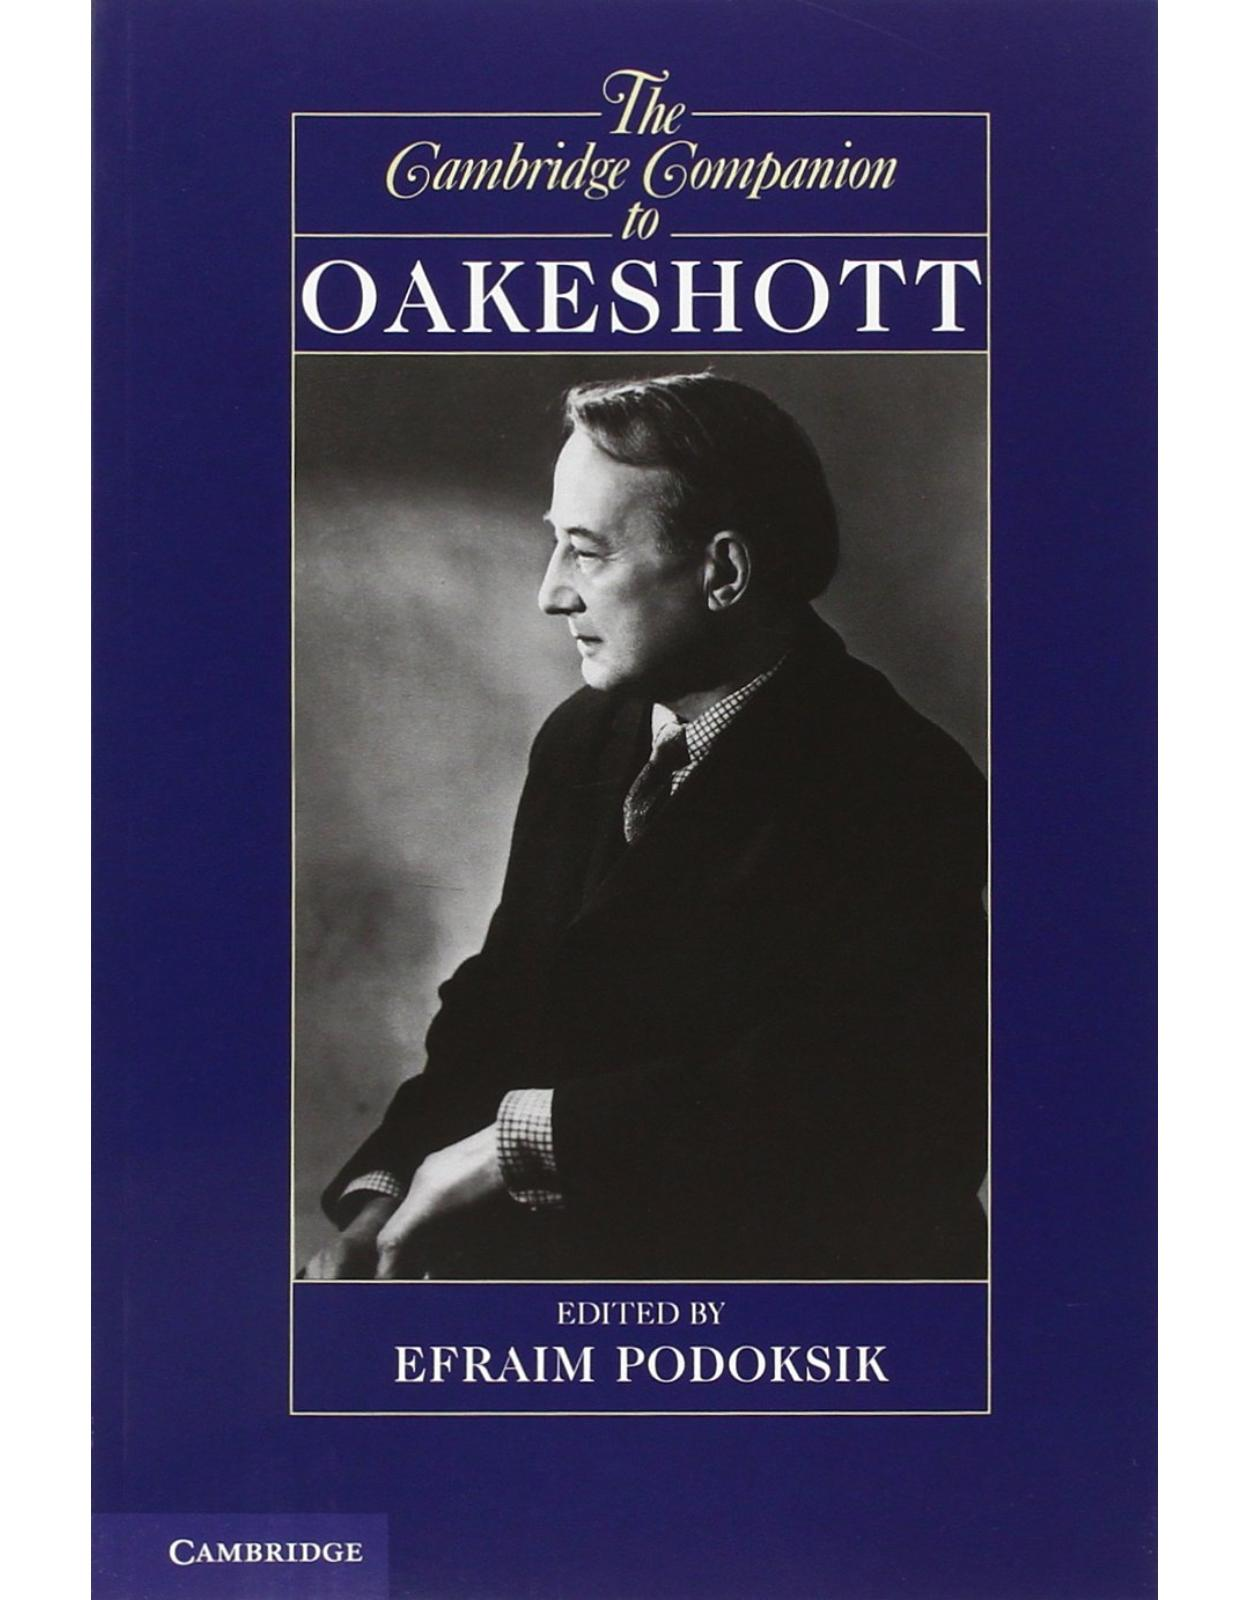 The Cambridge Companion to Oakeshott (Cambridge Companions to Philosophy)